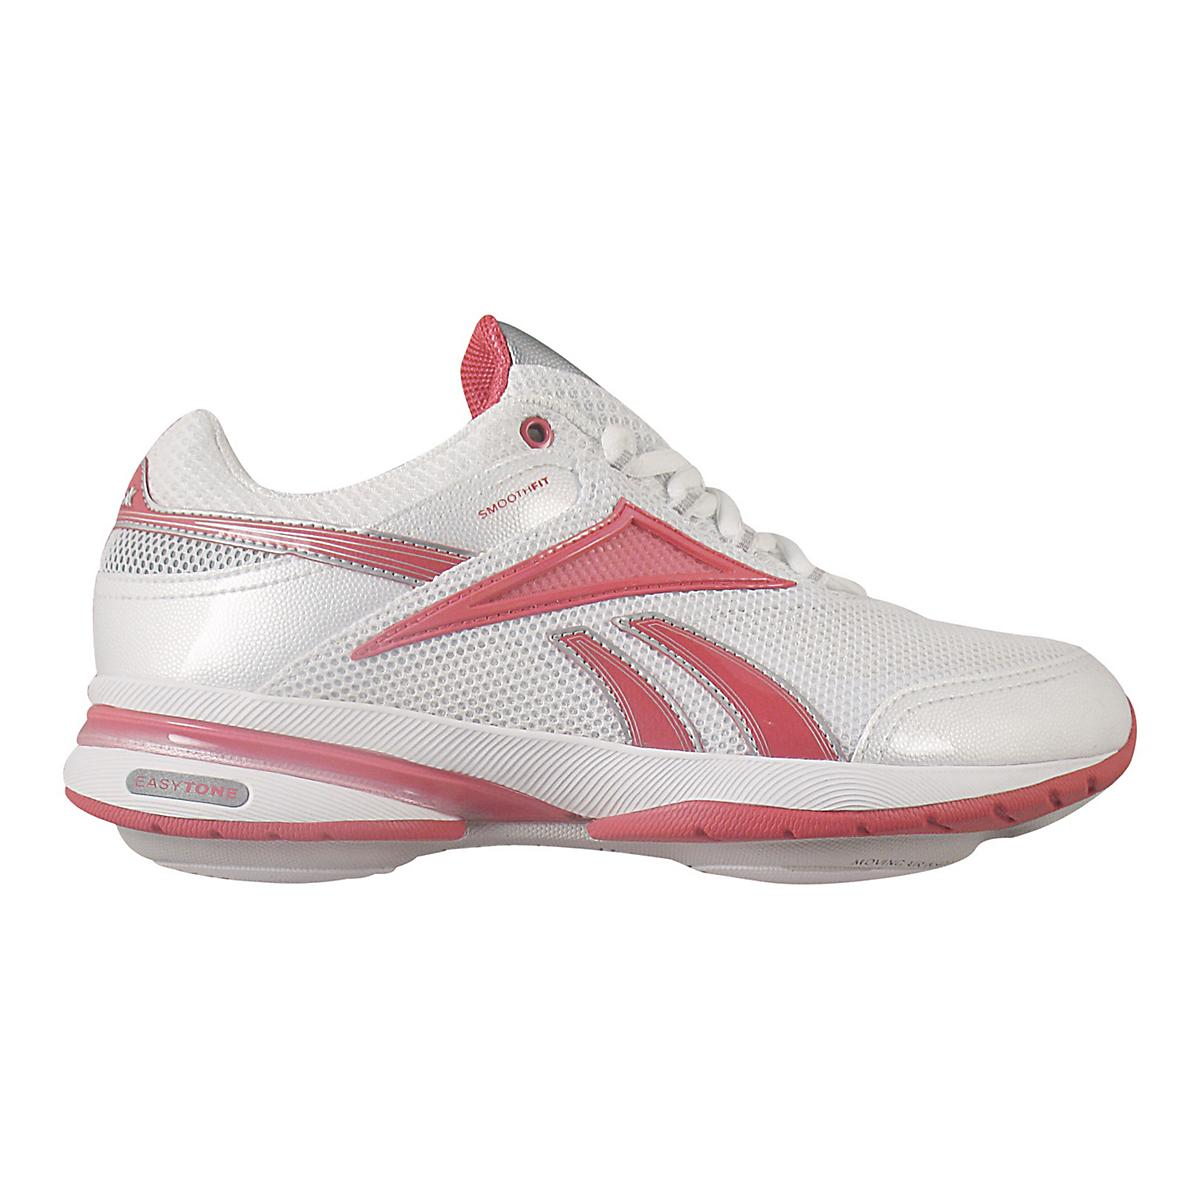 Womens Reebok EasyTone Reenew Toning & Fitness Shoe at